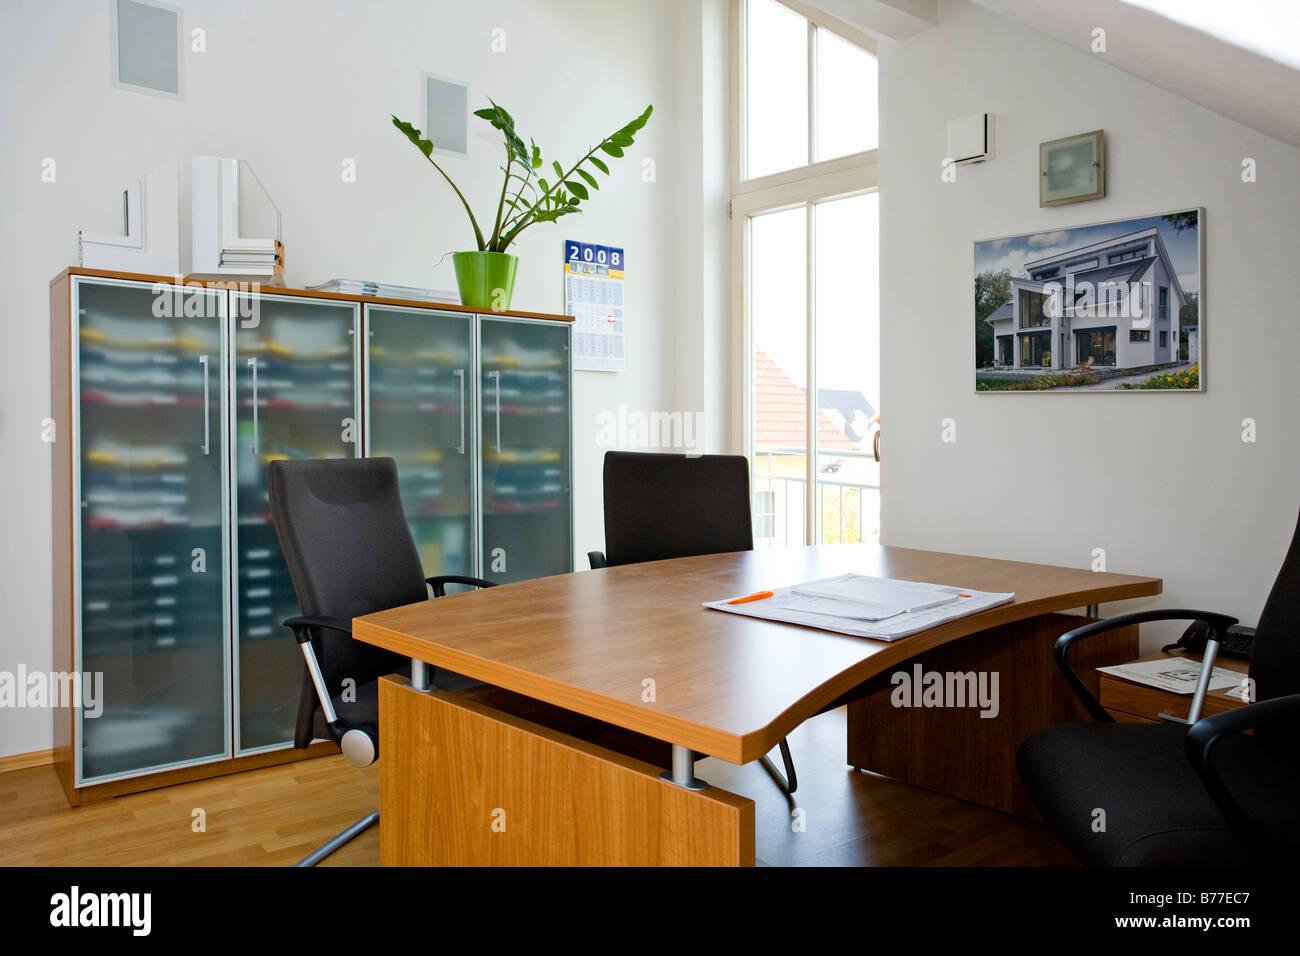 Modernes Arbeitszimmer, modernen home-office Stockfoto, Bild ...